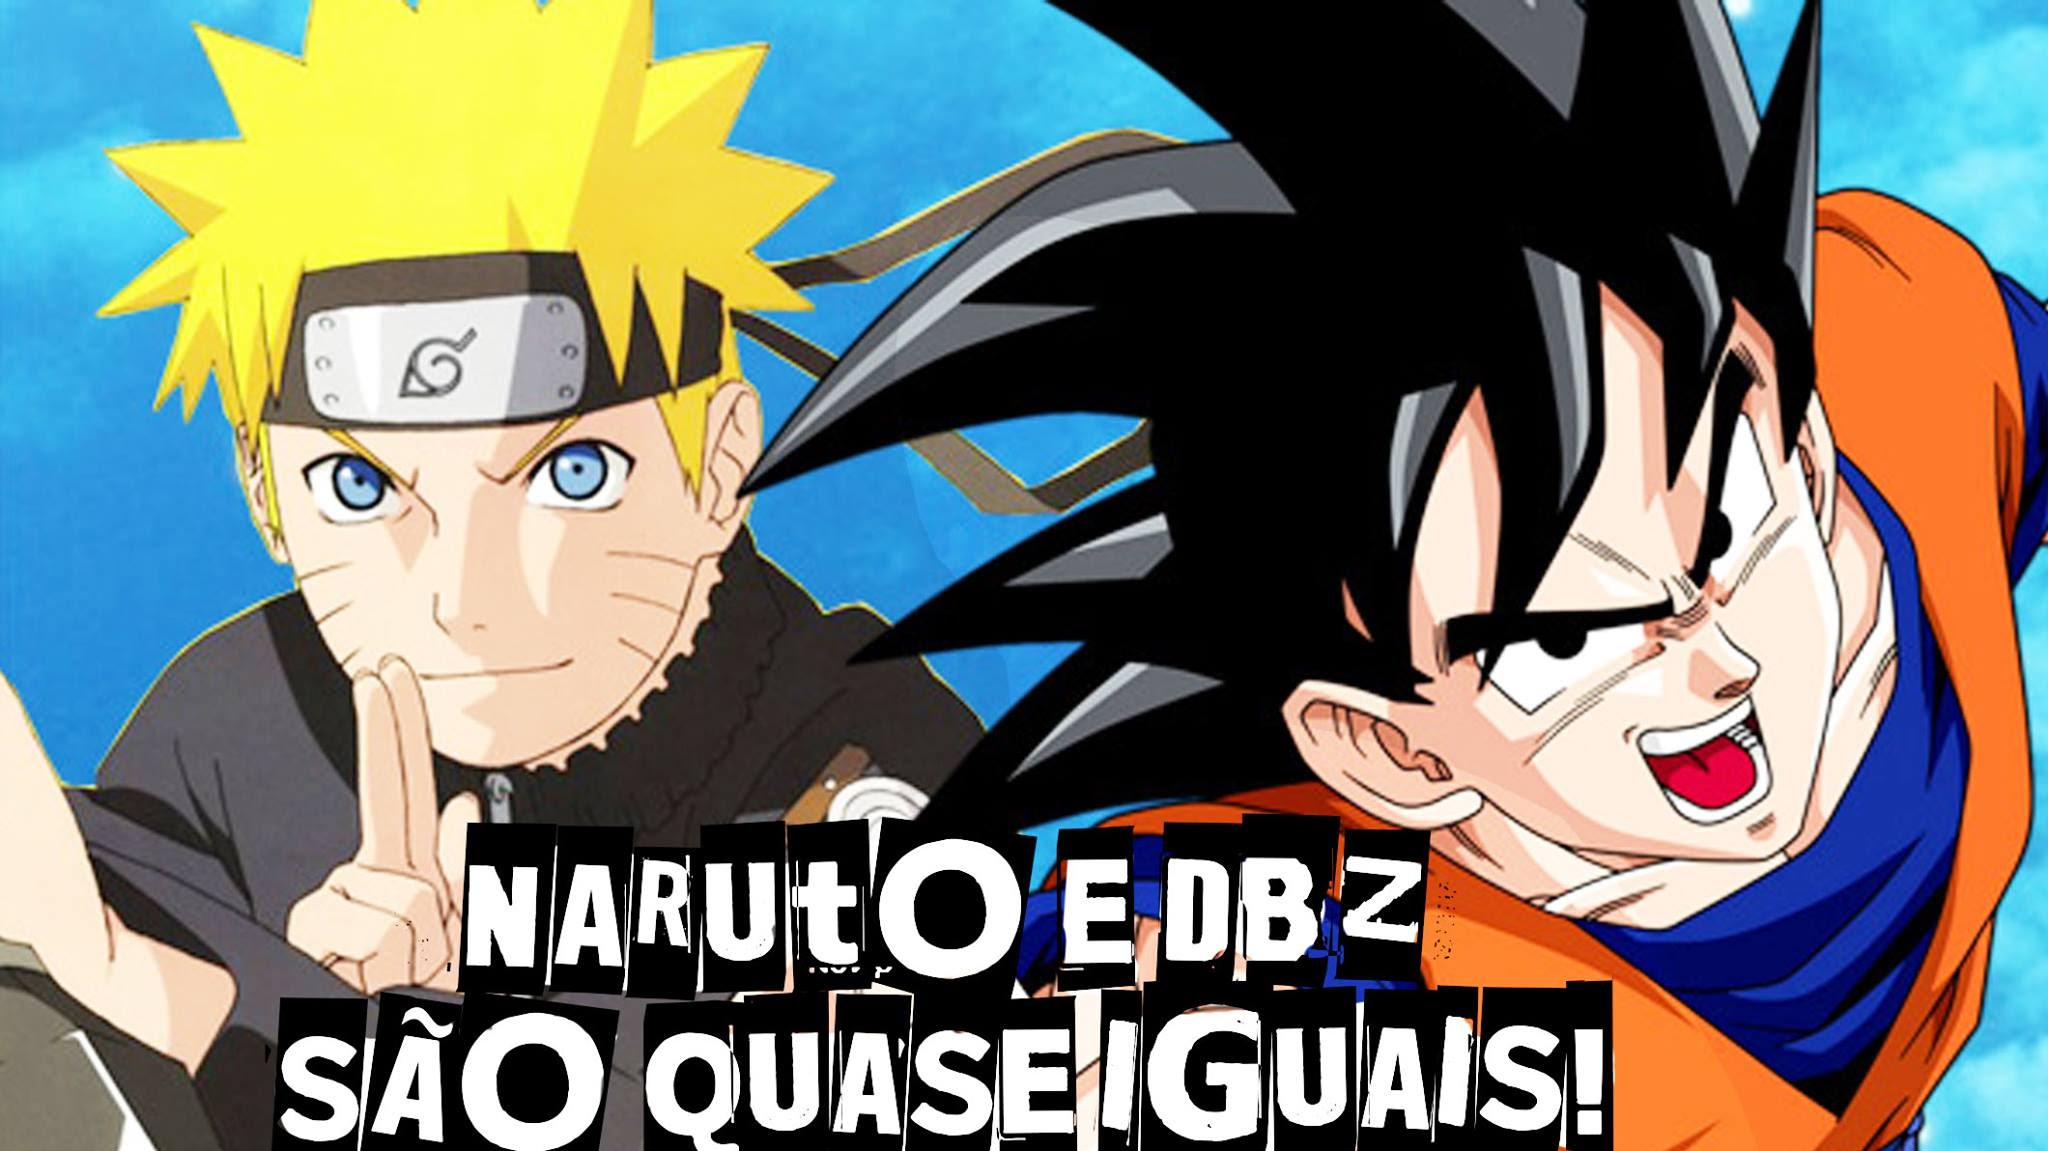 Naruto e dragon ball semelhanas impressionantes ei nerd naruto e dragon ball semelhanas impressionantes reheart Choice Image